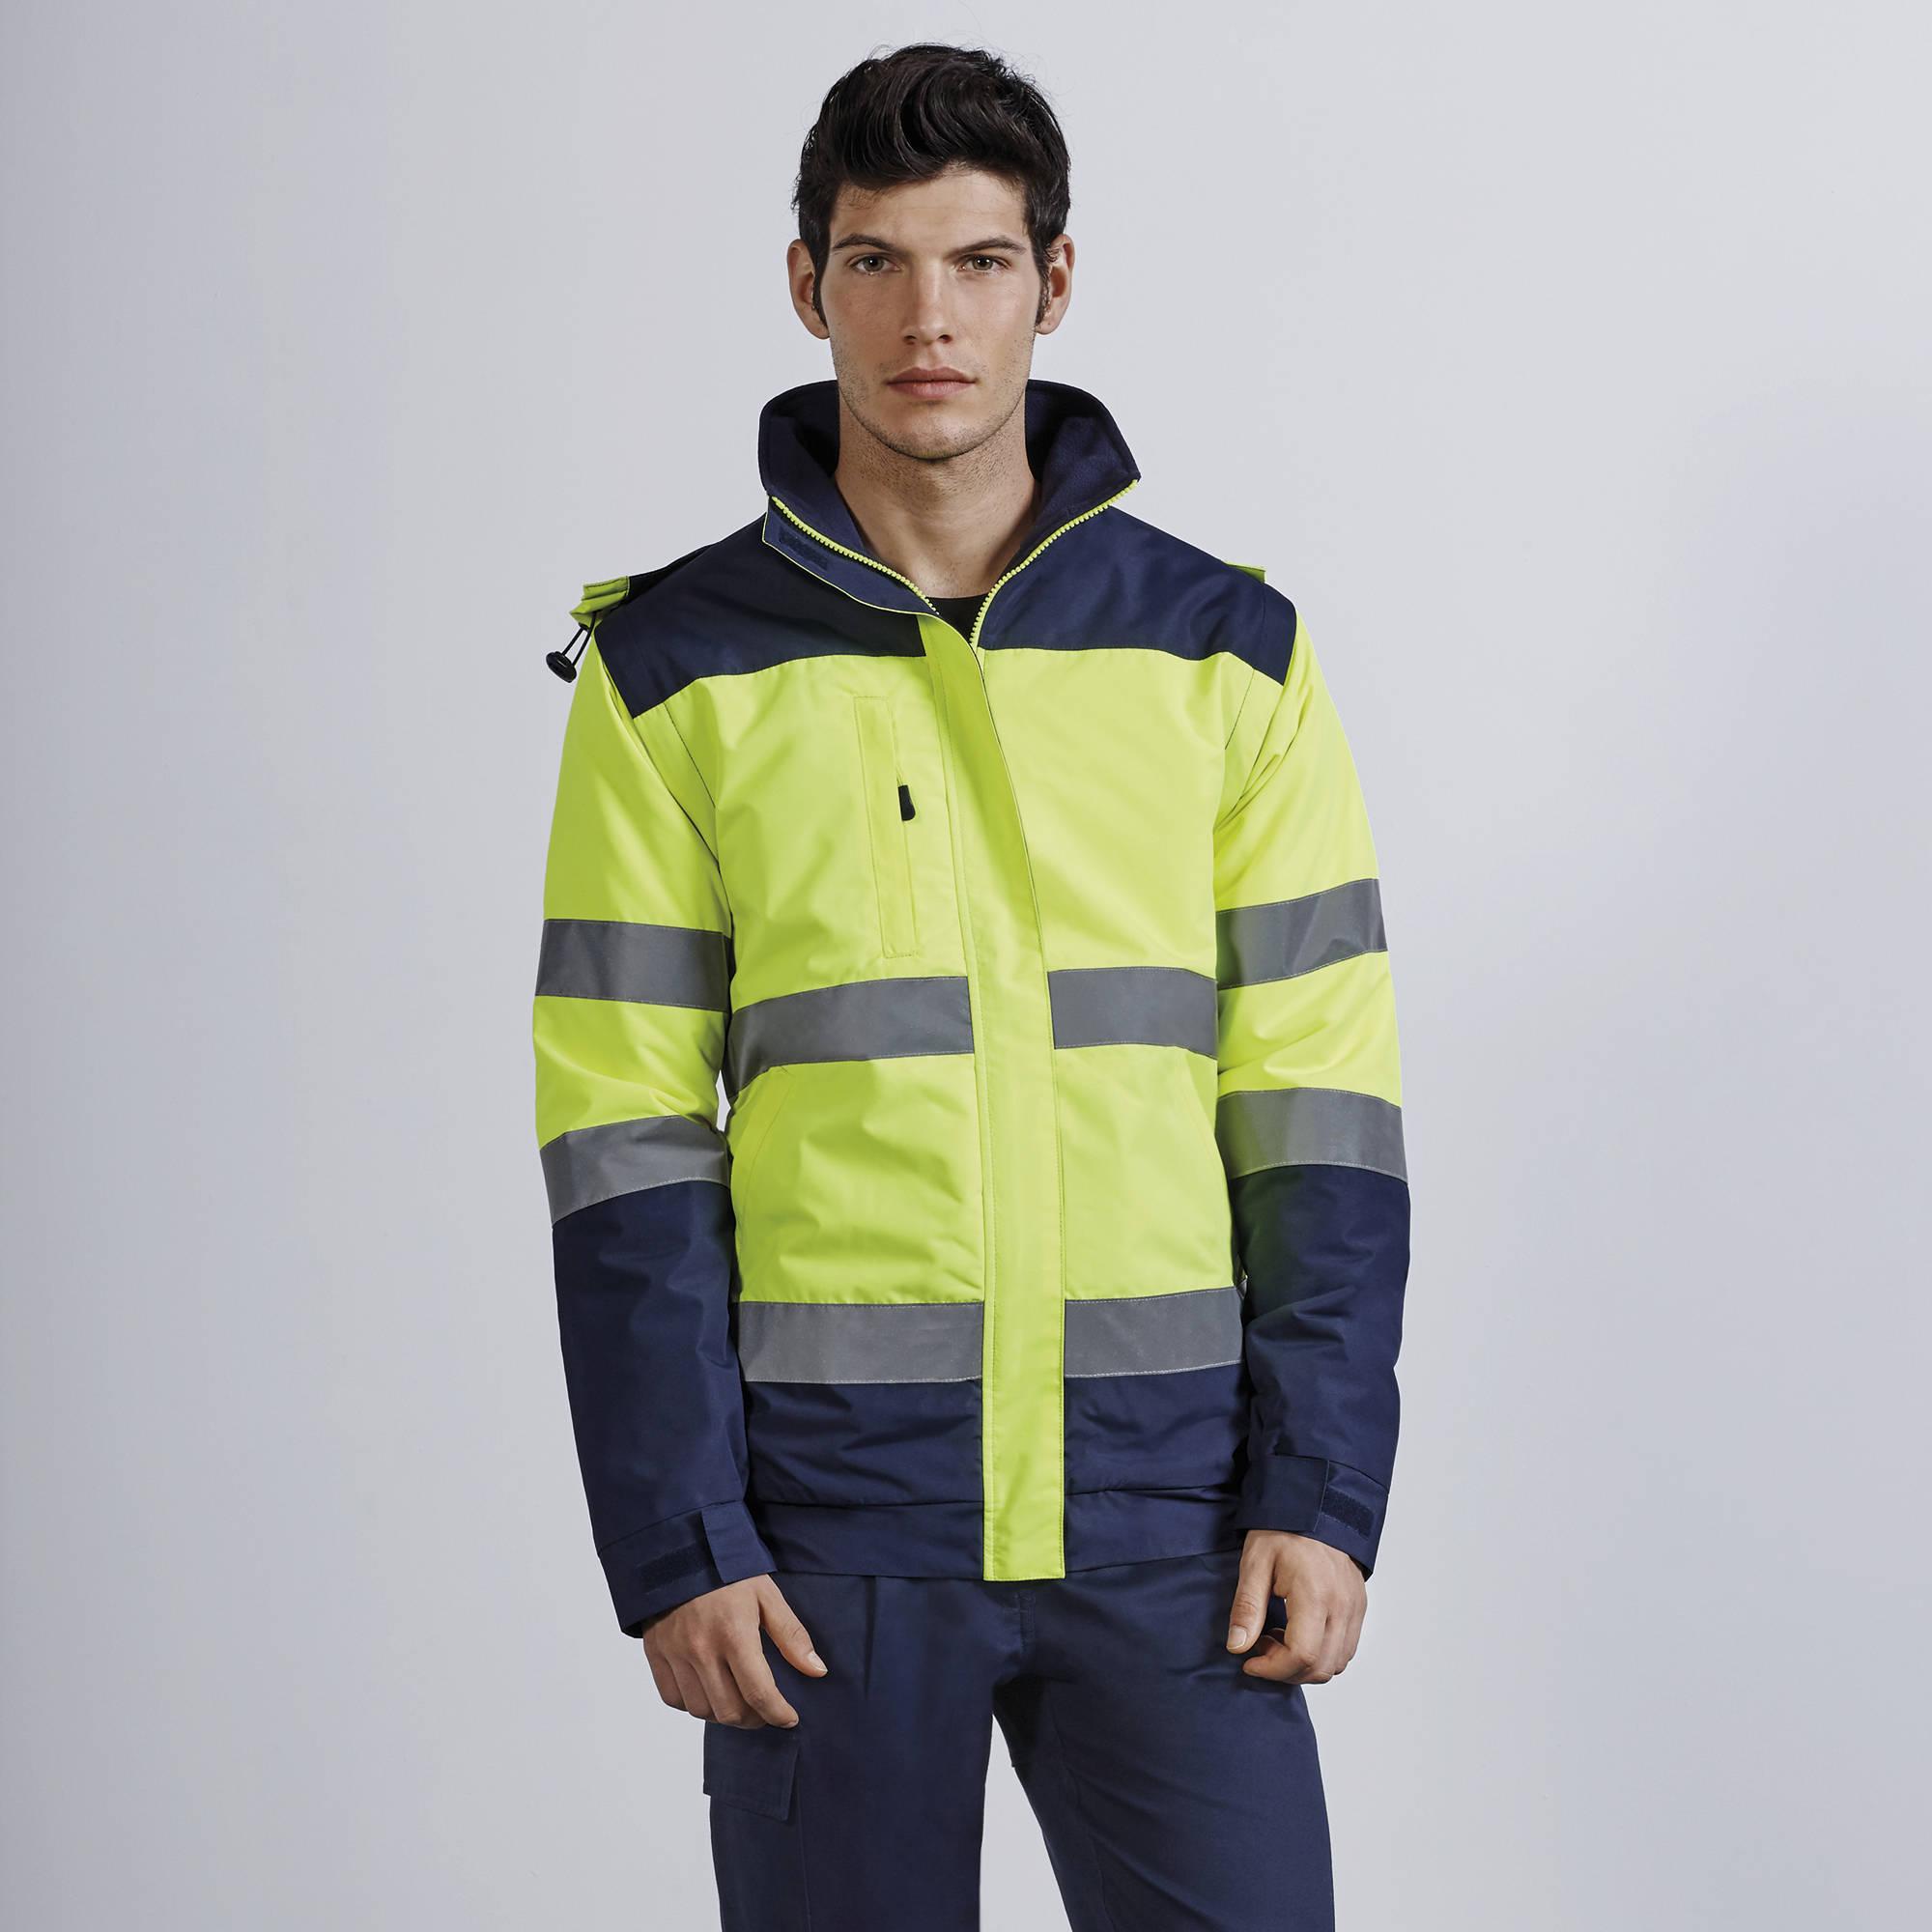 Hi-Vis jacket Epsylon  με κεντημένα ή αποσπώμενα σήματα ΕΛ.ΑΣ.